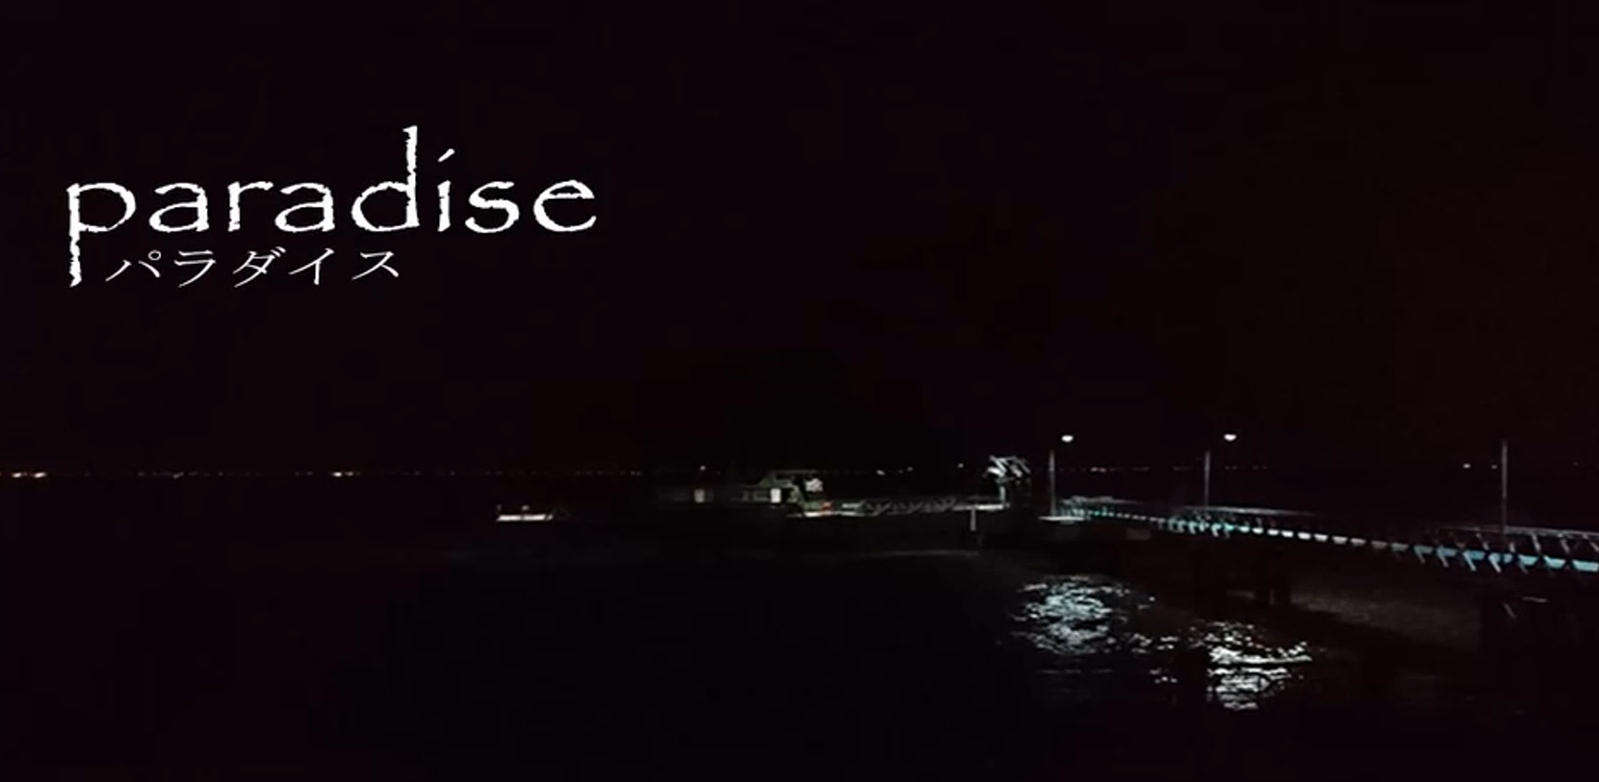 Paradise Free Download